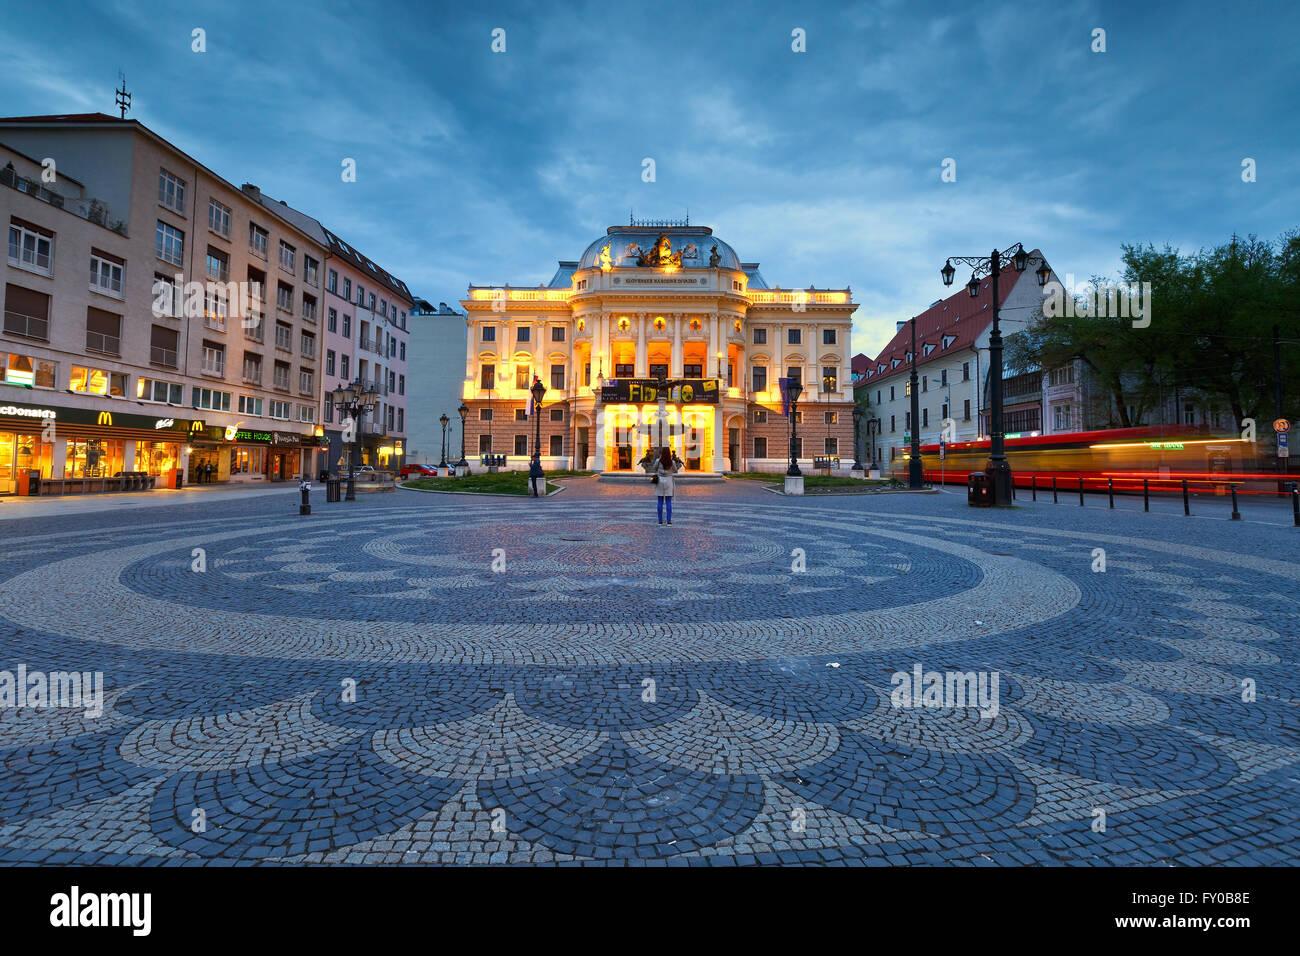 National theatre in Hviezdoslav square in the old town of Bratislava. - Stock Image